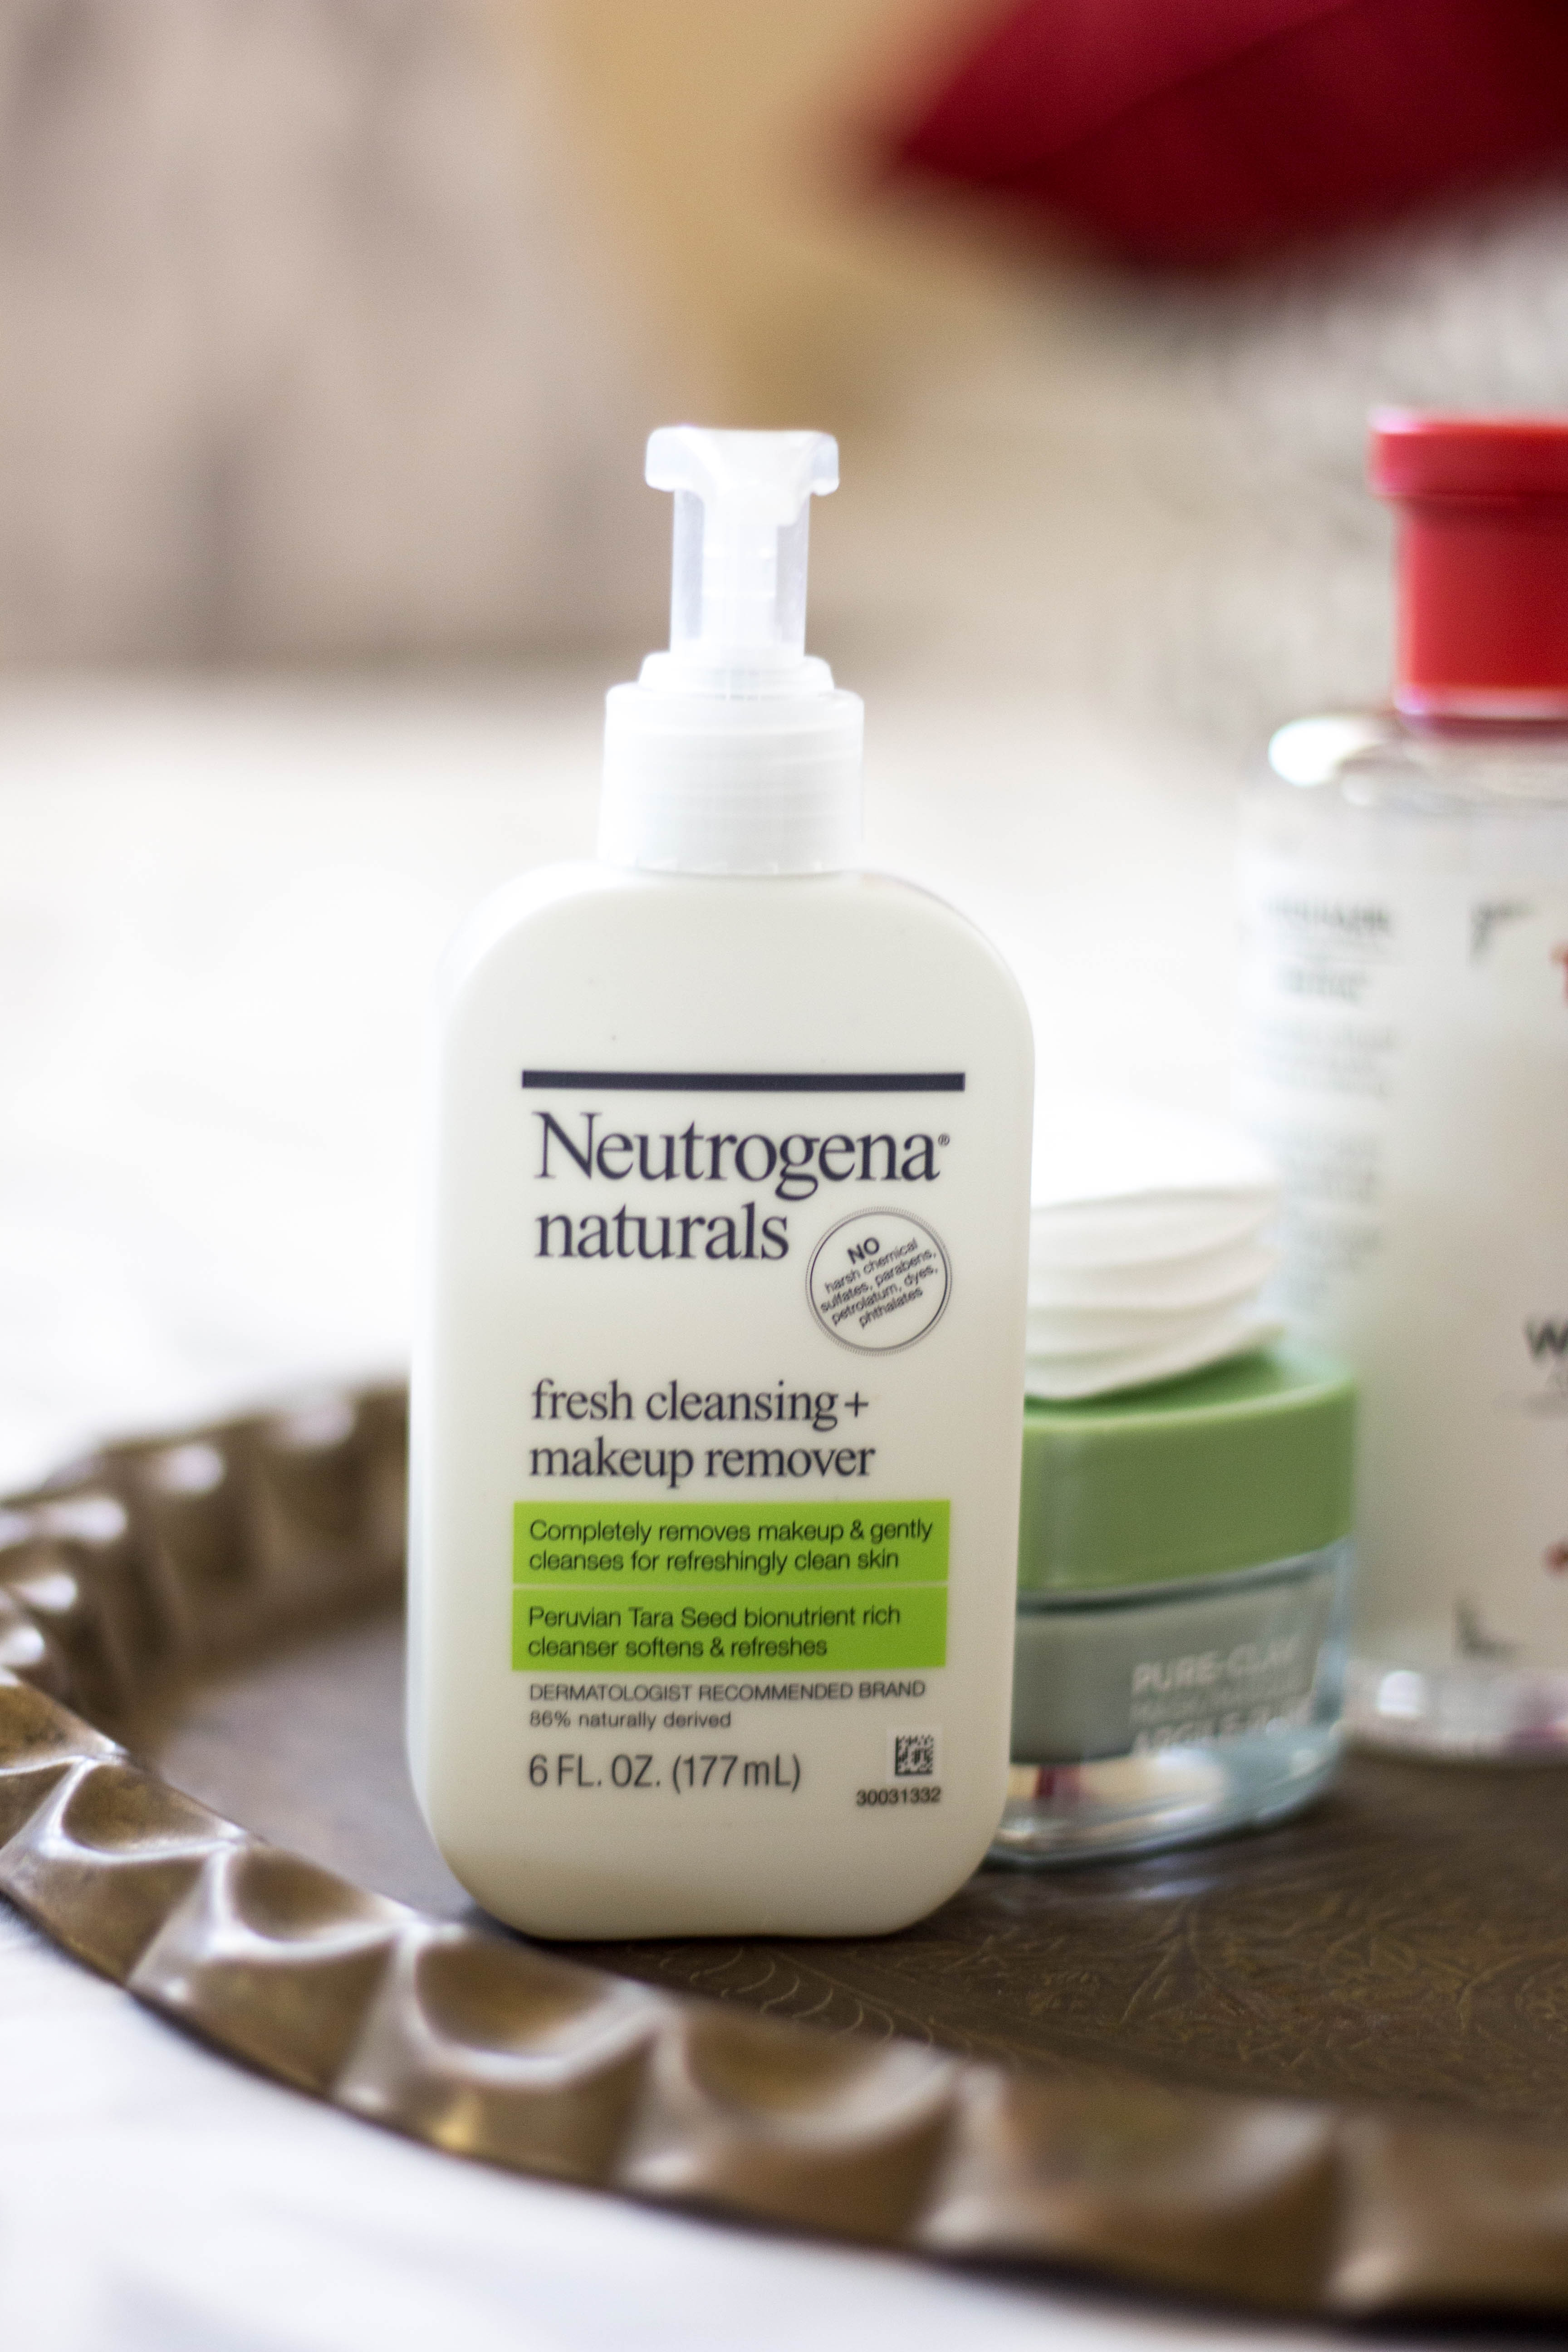 neutrogena naturals facial cleanser